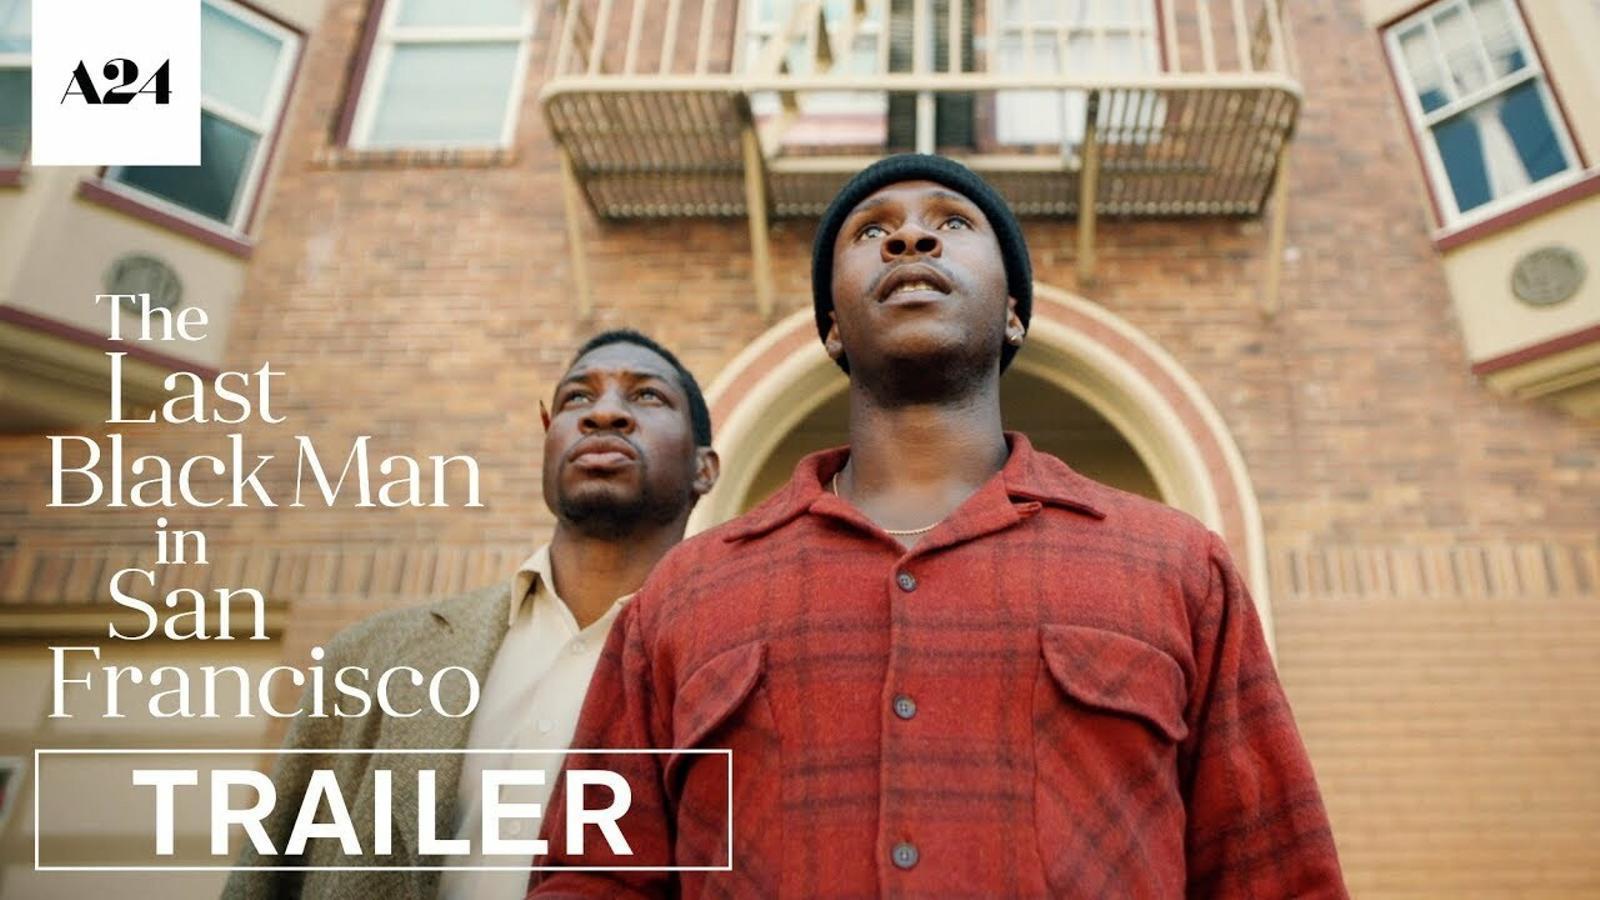 Tràiler de 'The last black man in San Francisco'